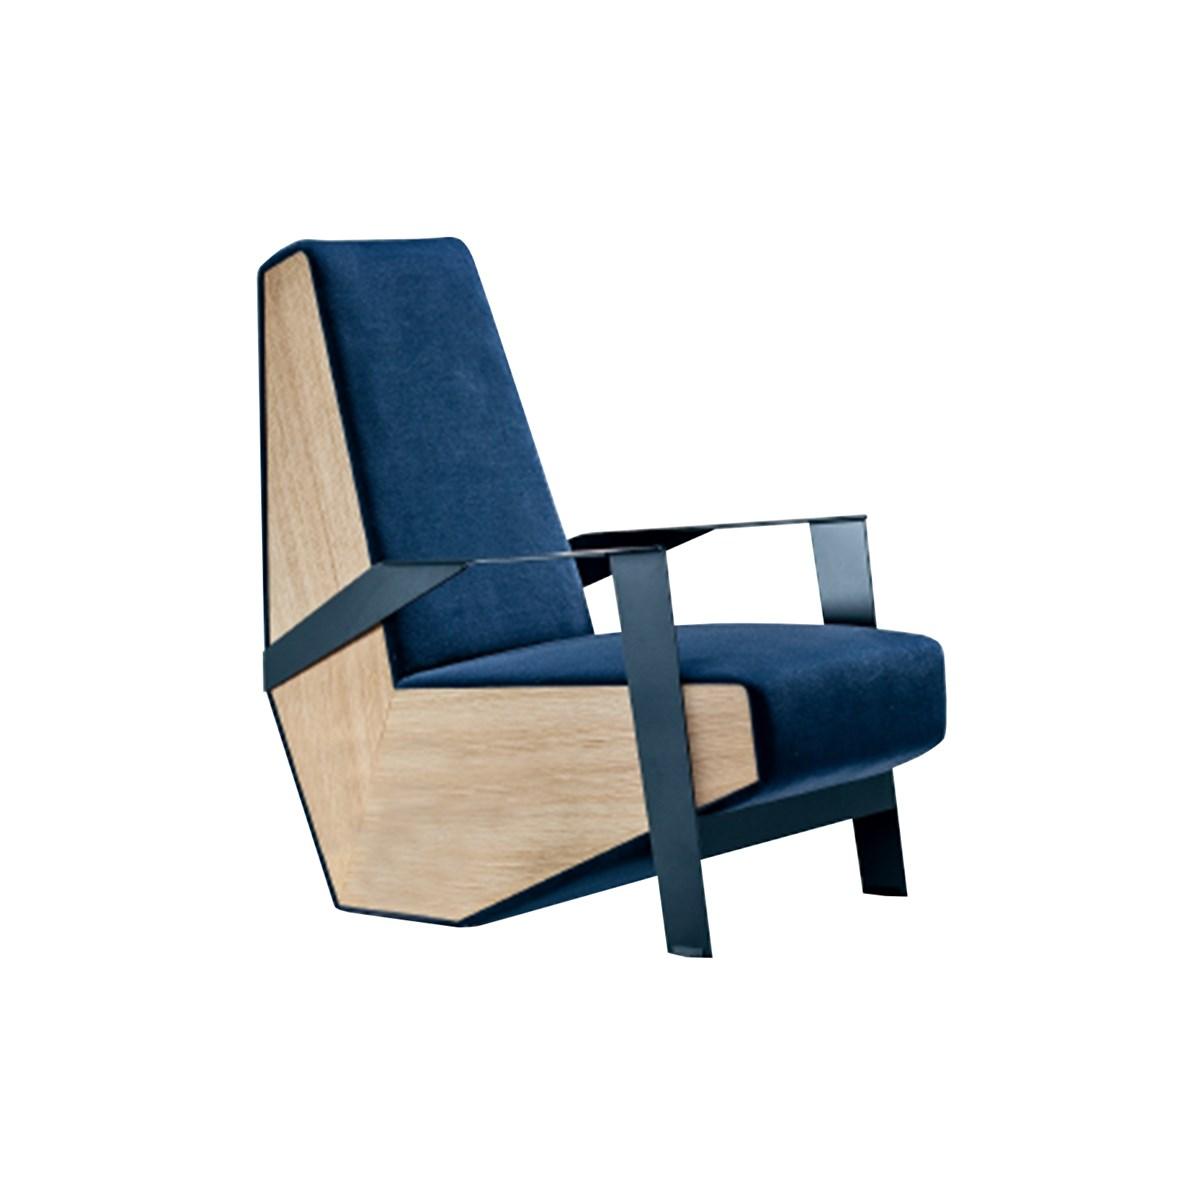 Moroso-Patricia-Urquiola-Silver-Lake-Armchair-Matisse-1